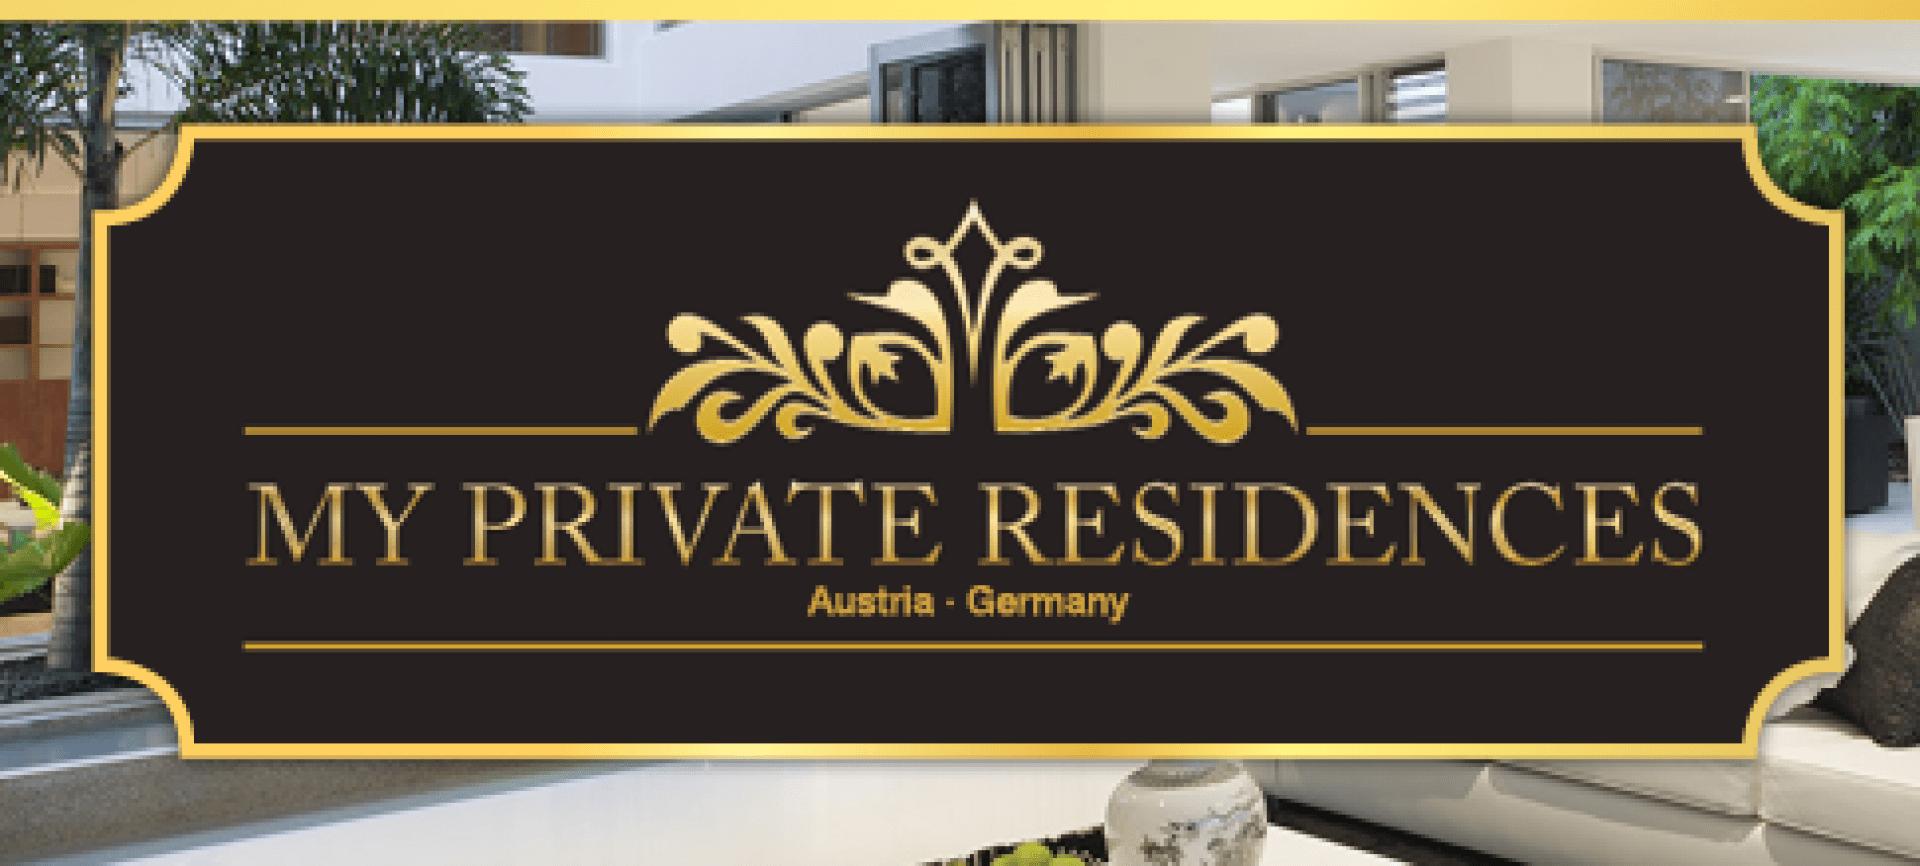 Immobiliengutachten Schönberg // My Private Residences